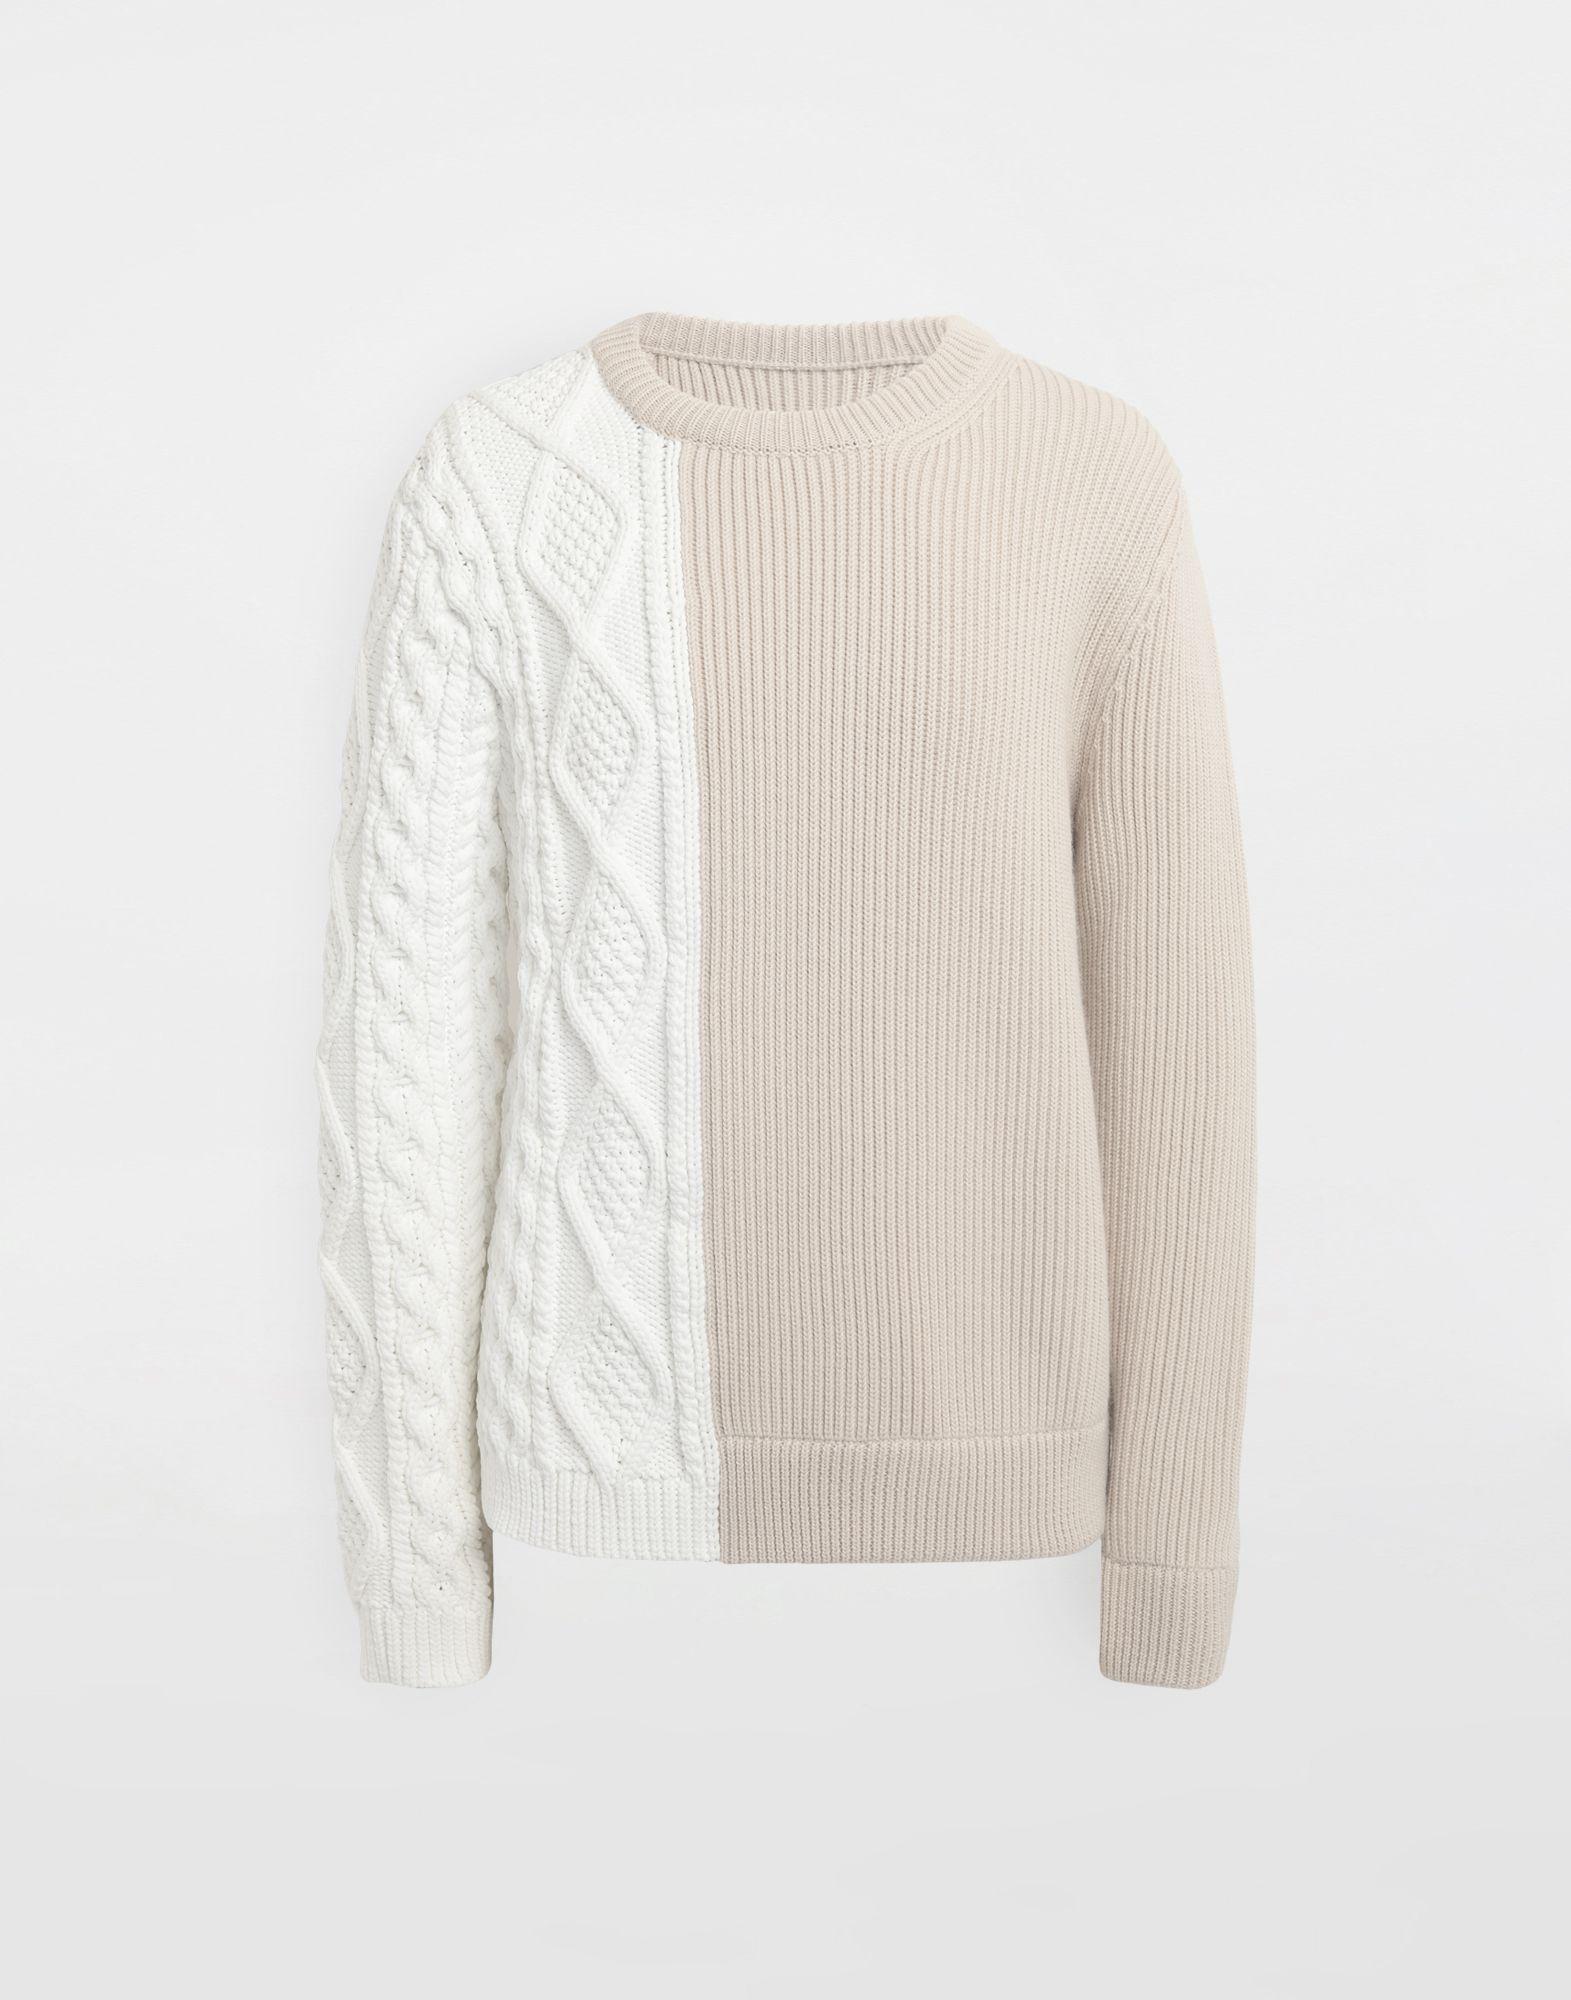 MAISON MARGIELA Spliced knit pullover Crewneck sweater Man f